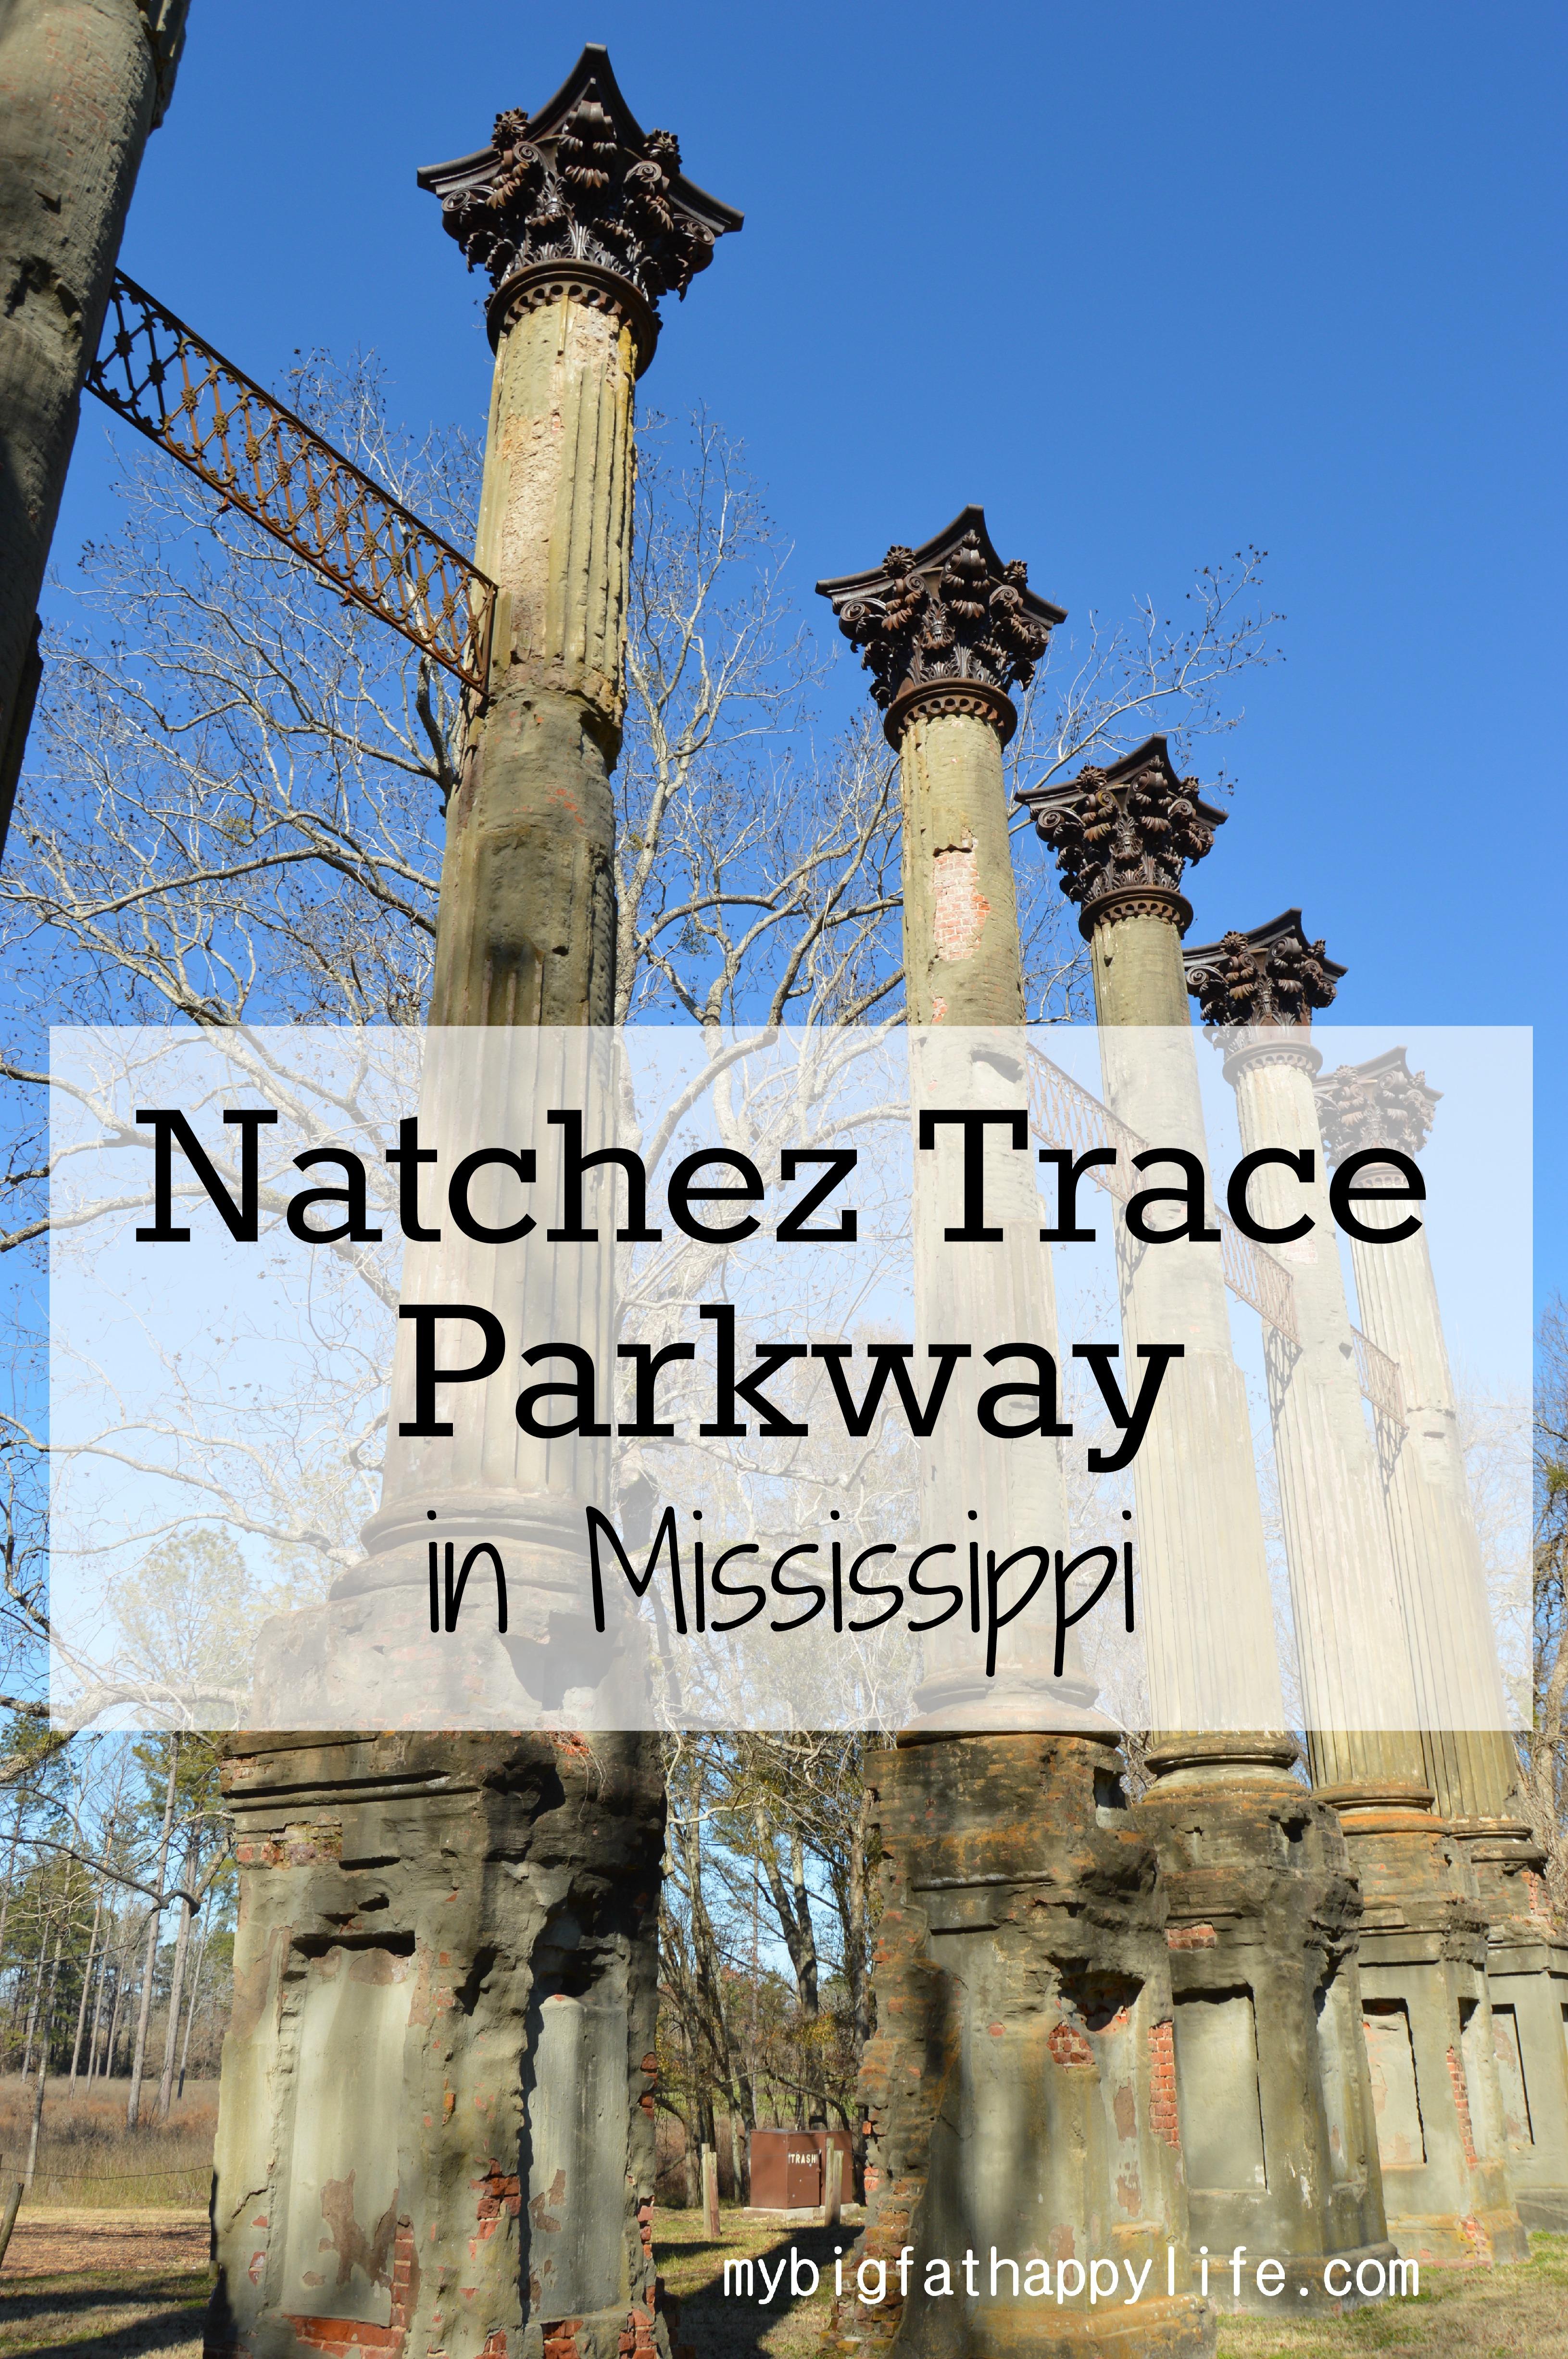 Celebrating Home Decor Natchez Trace Parkway Natchez Mississippi My Big Fat